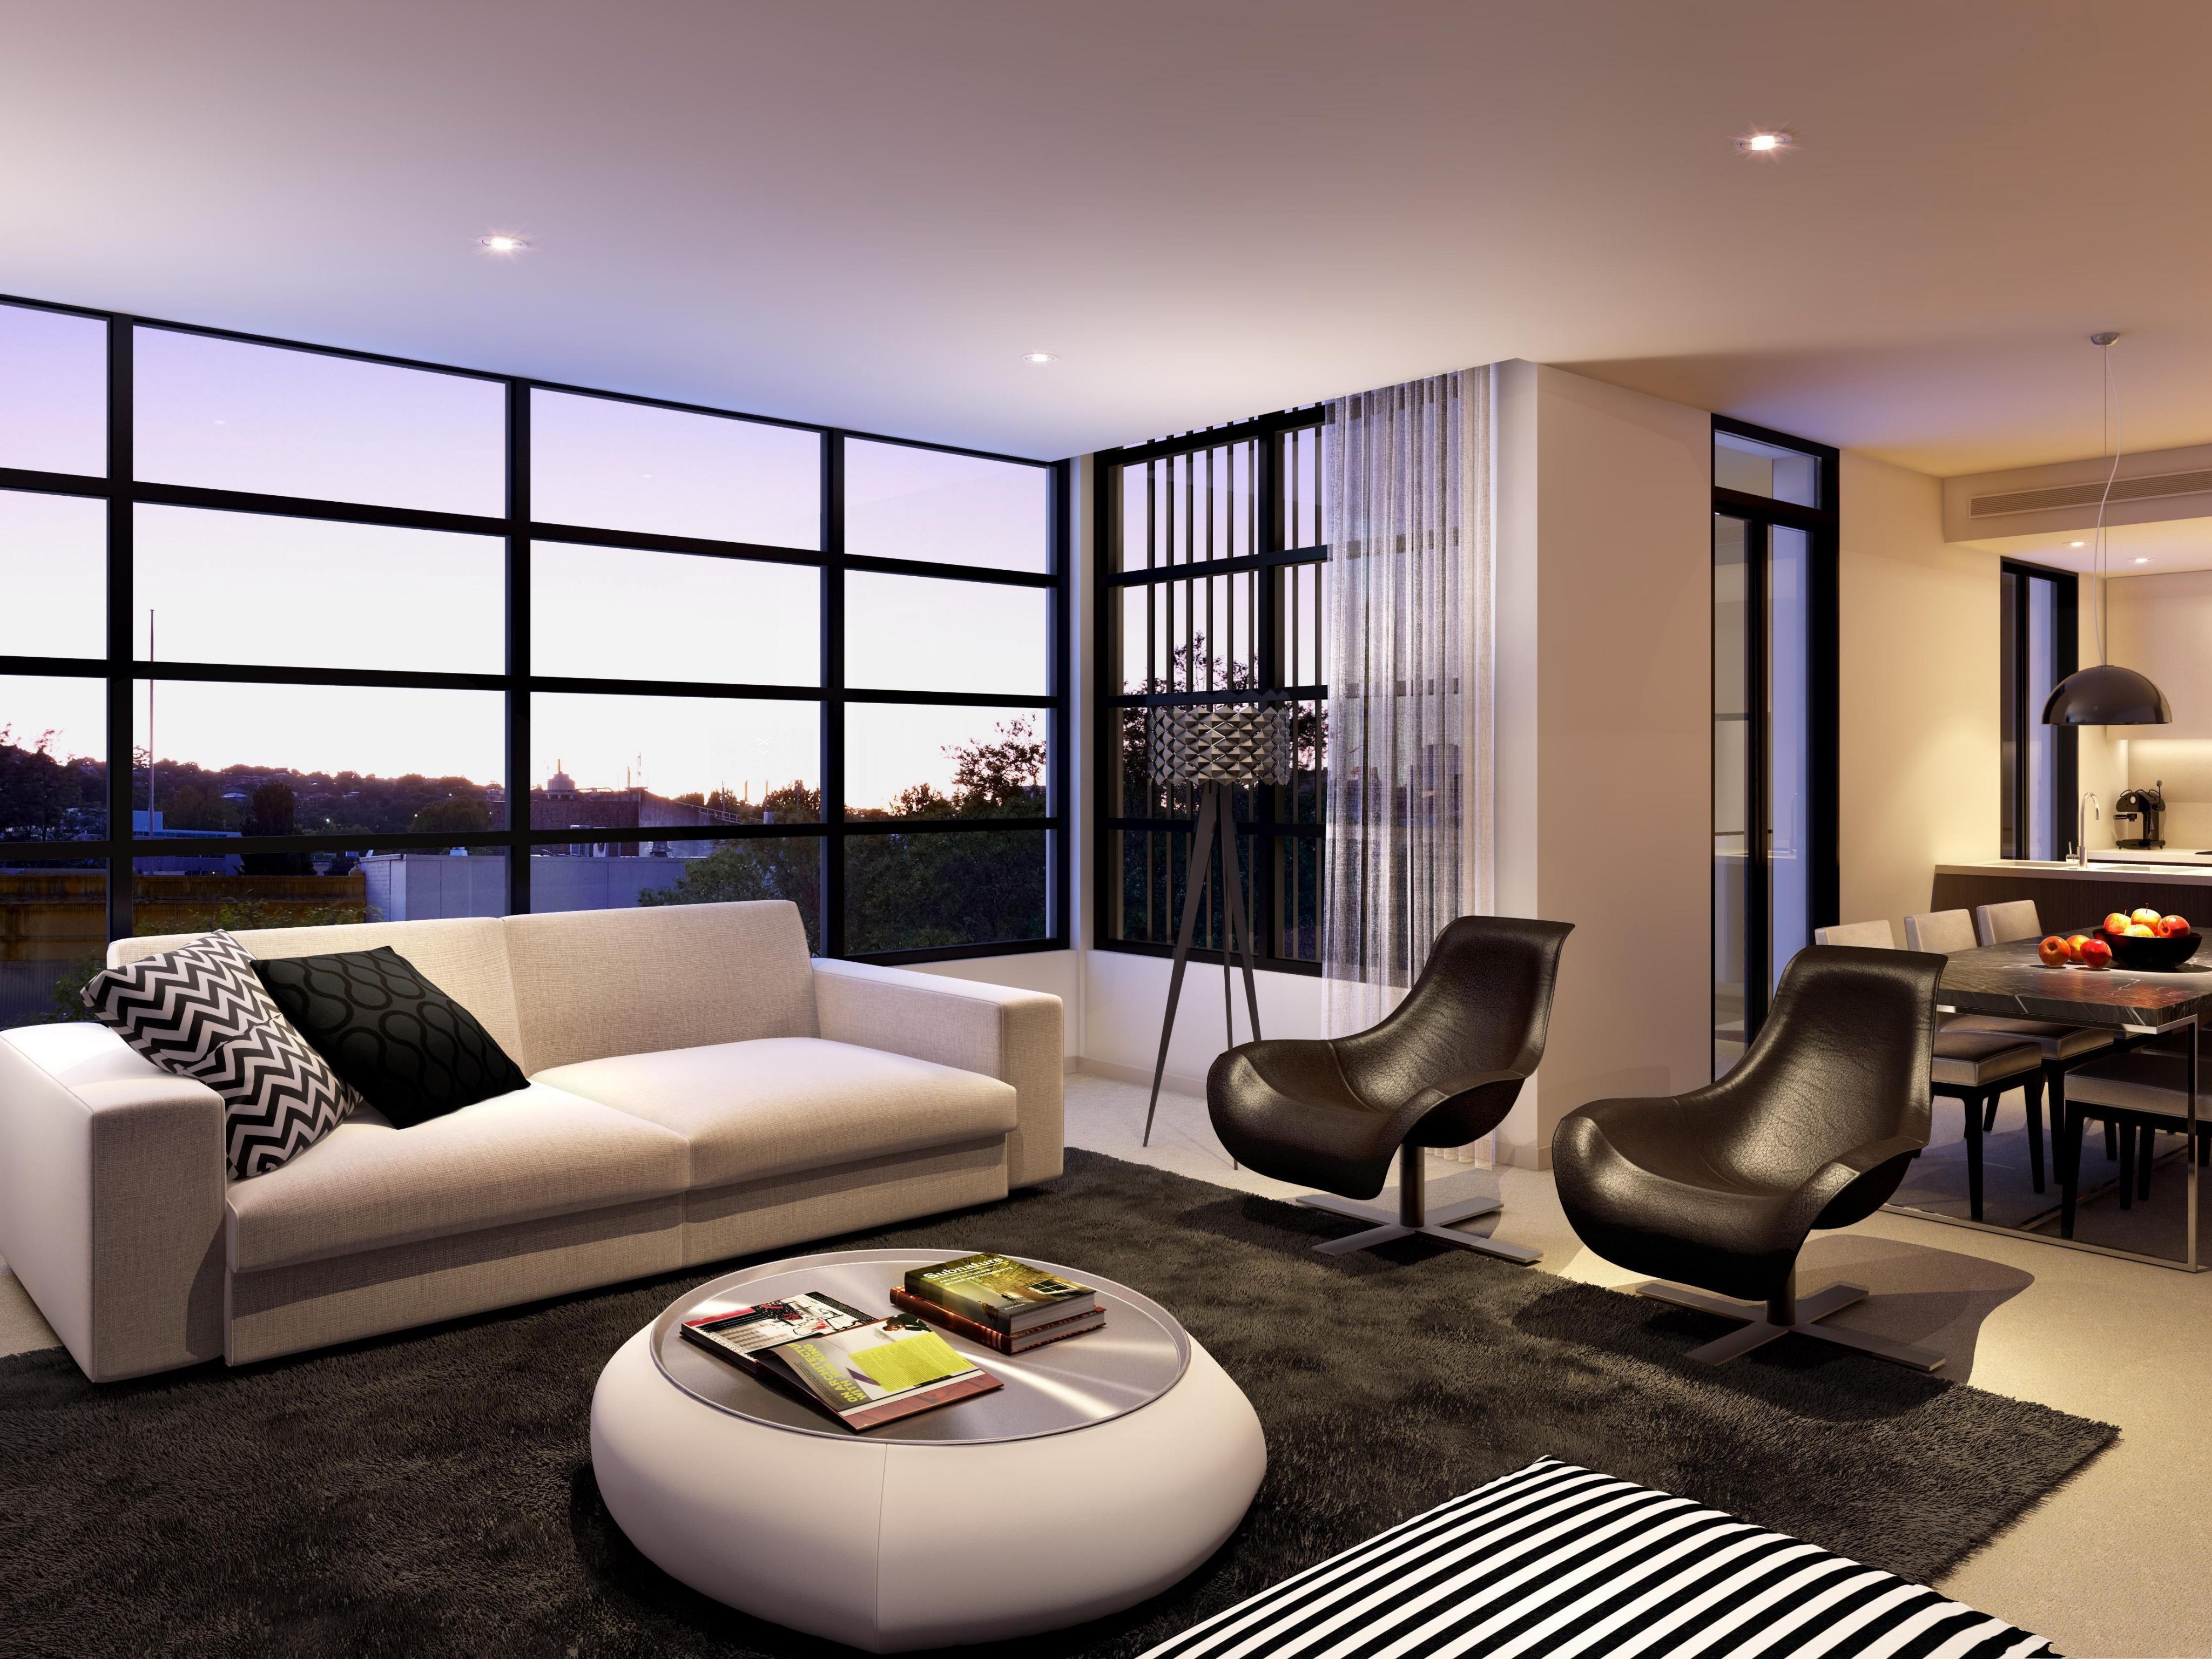 Wallpaper for small living room